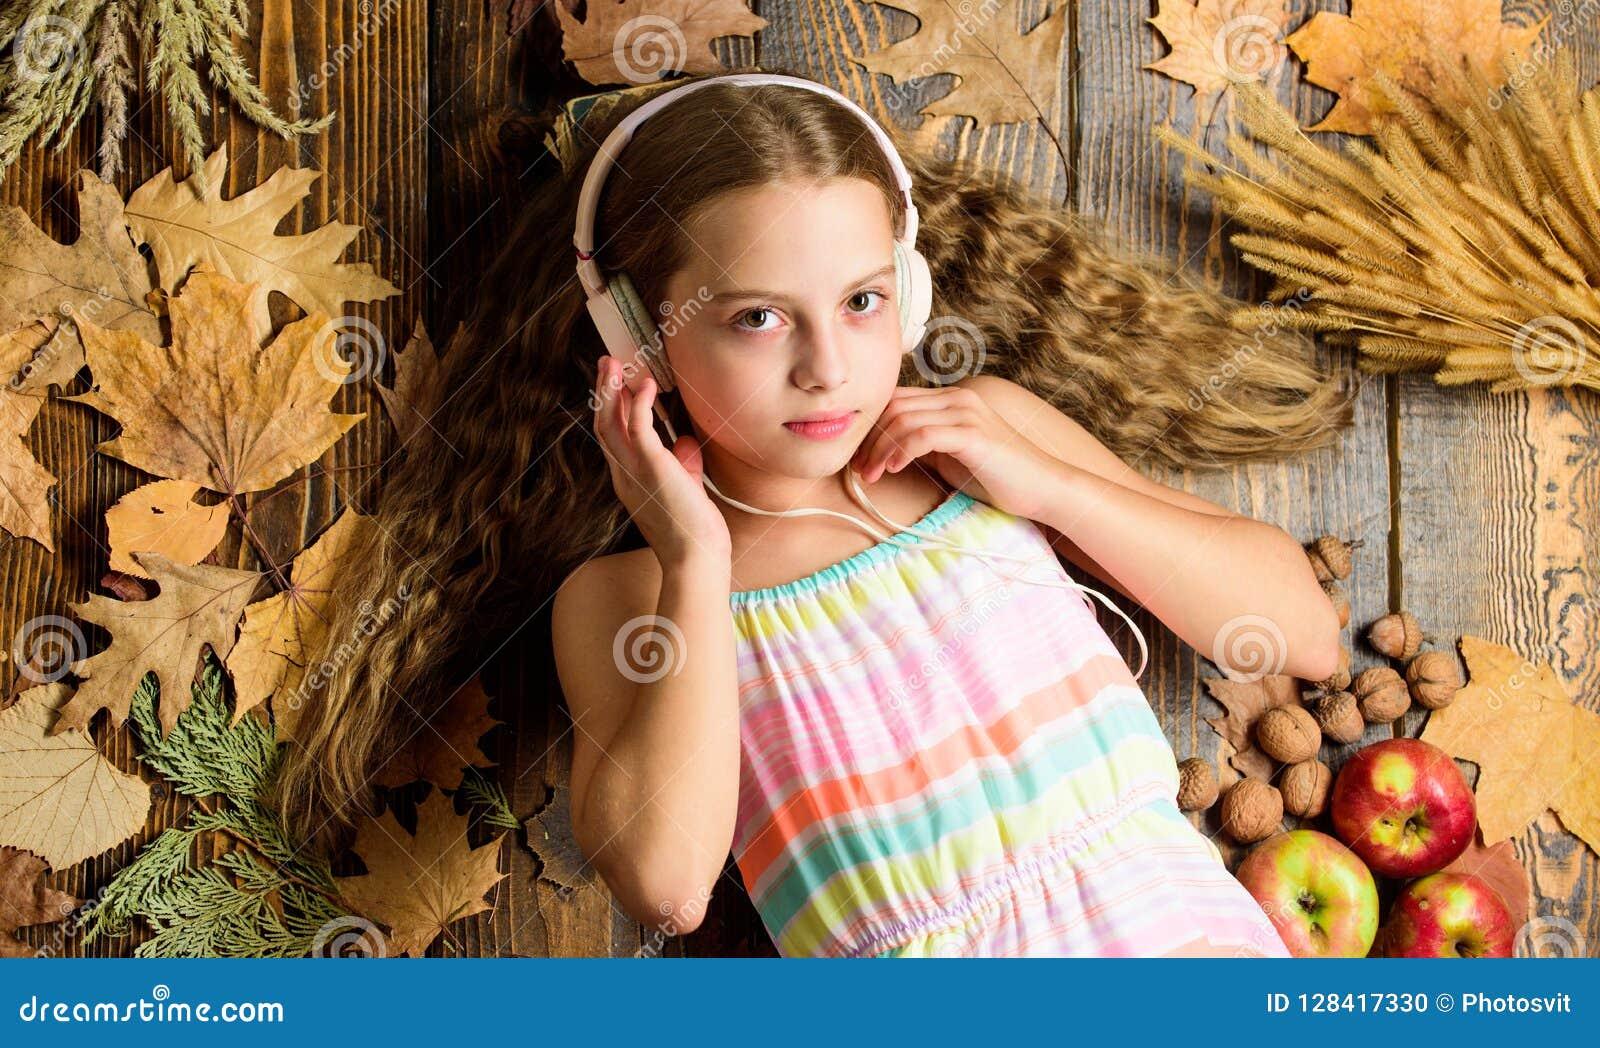 Kid girl wooden background listen music headphones autumn melody concept child listen music relaxing top view autumn music playlist